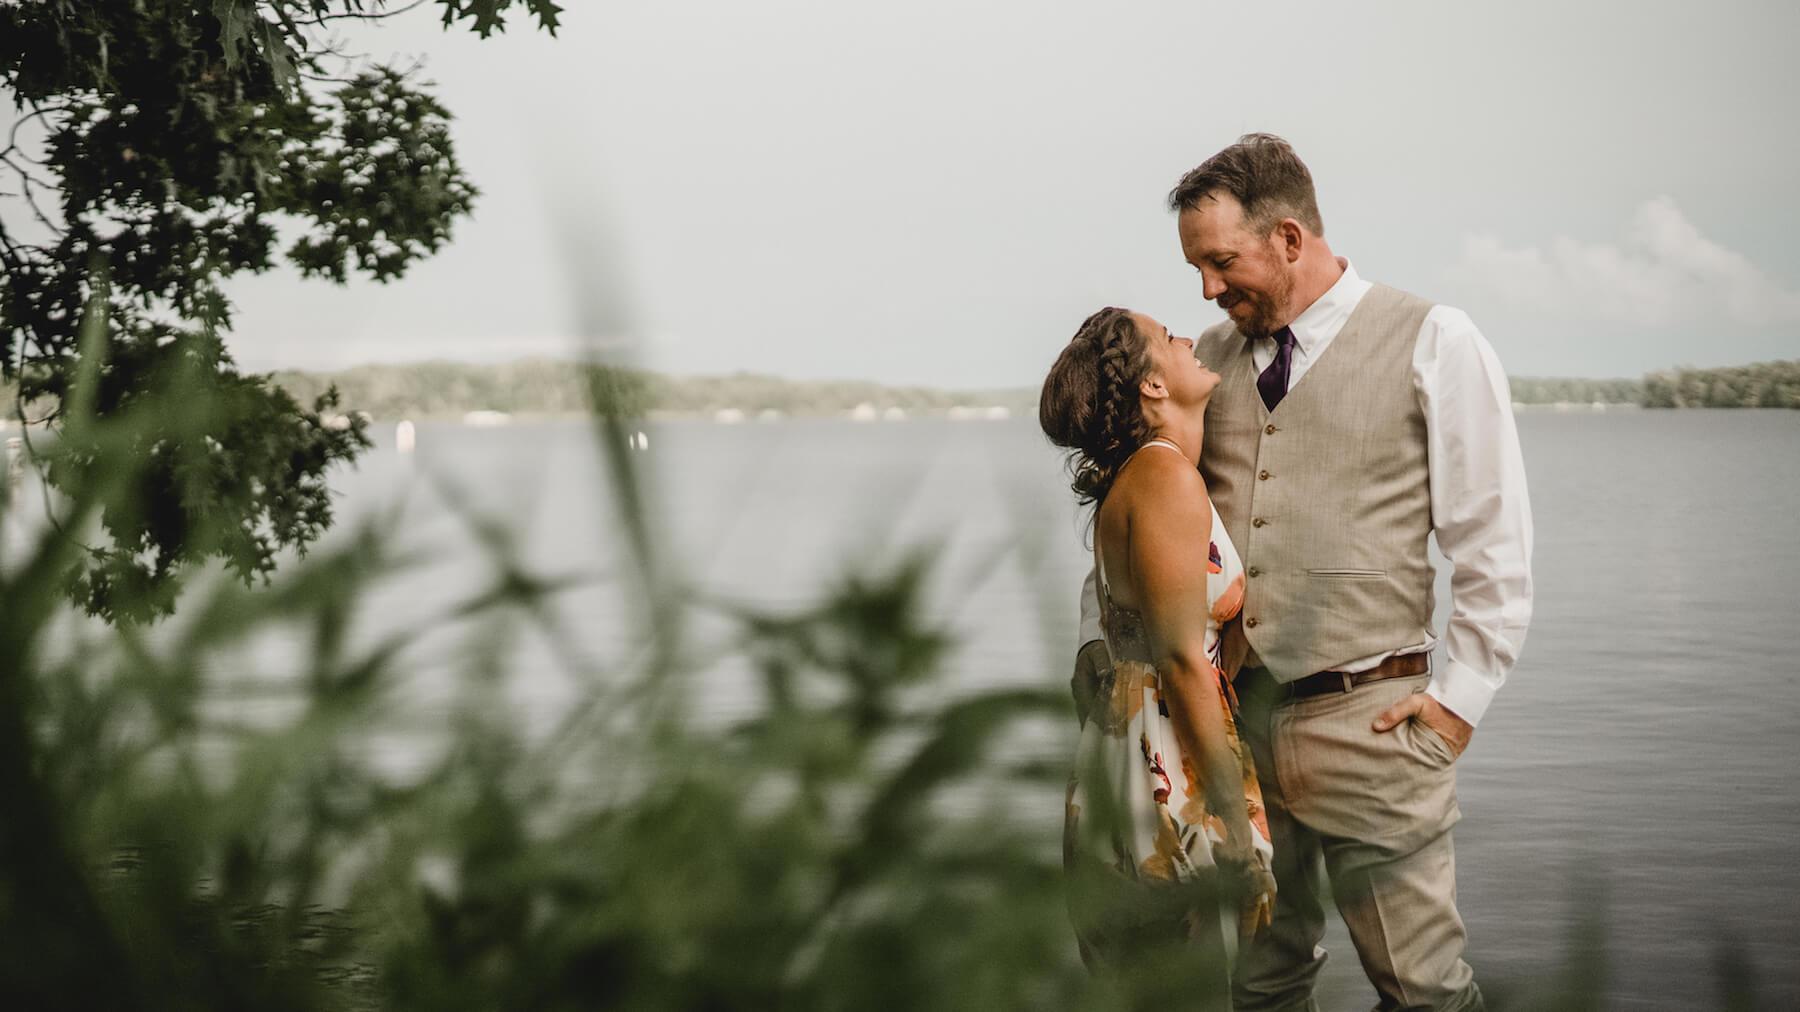 engle-olson-maddy-pat-mn-wedding-photography-48.jpg